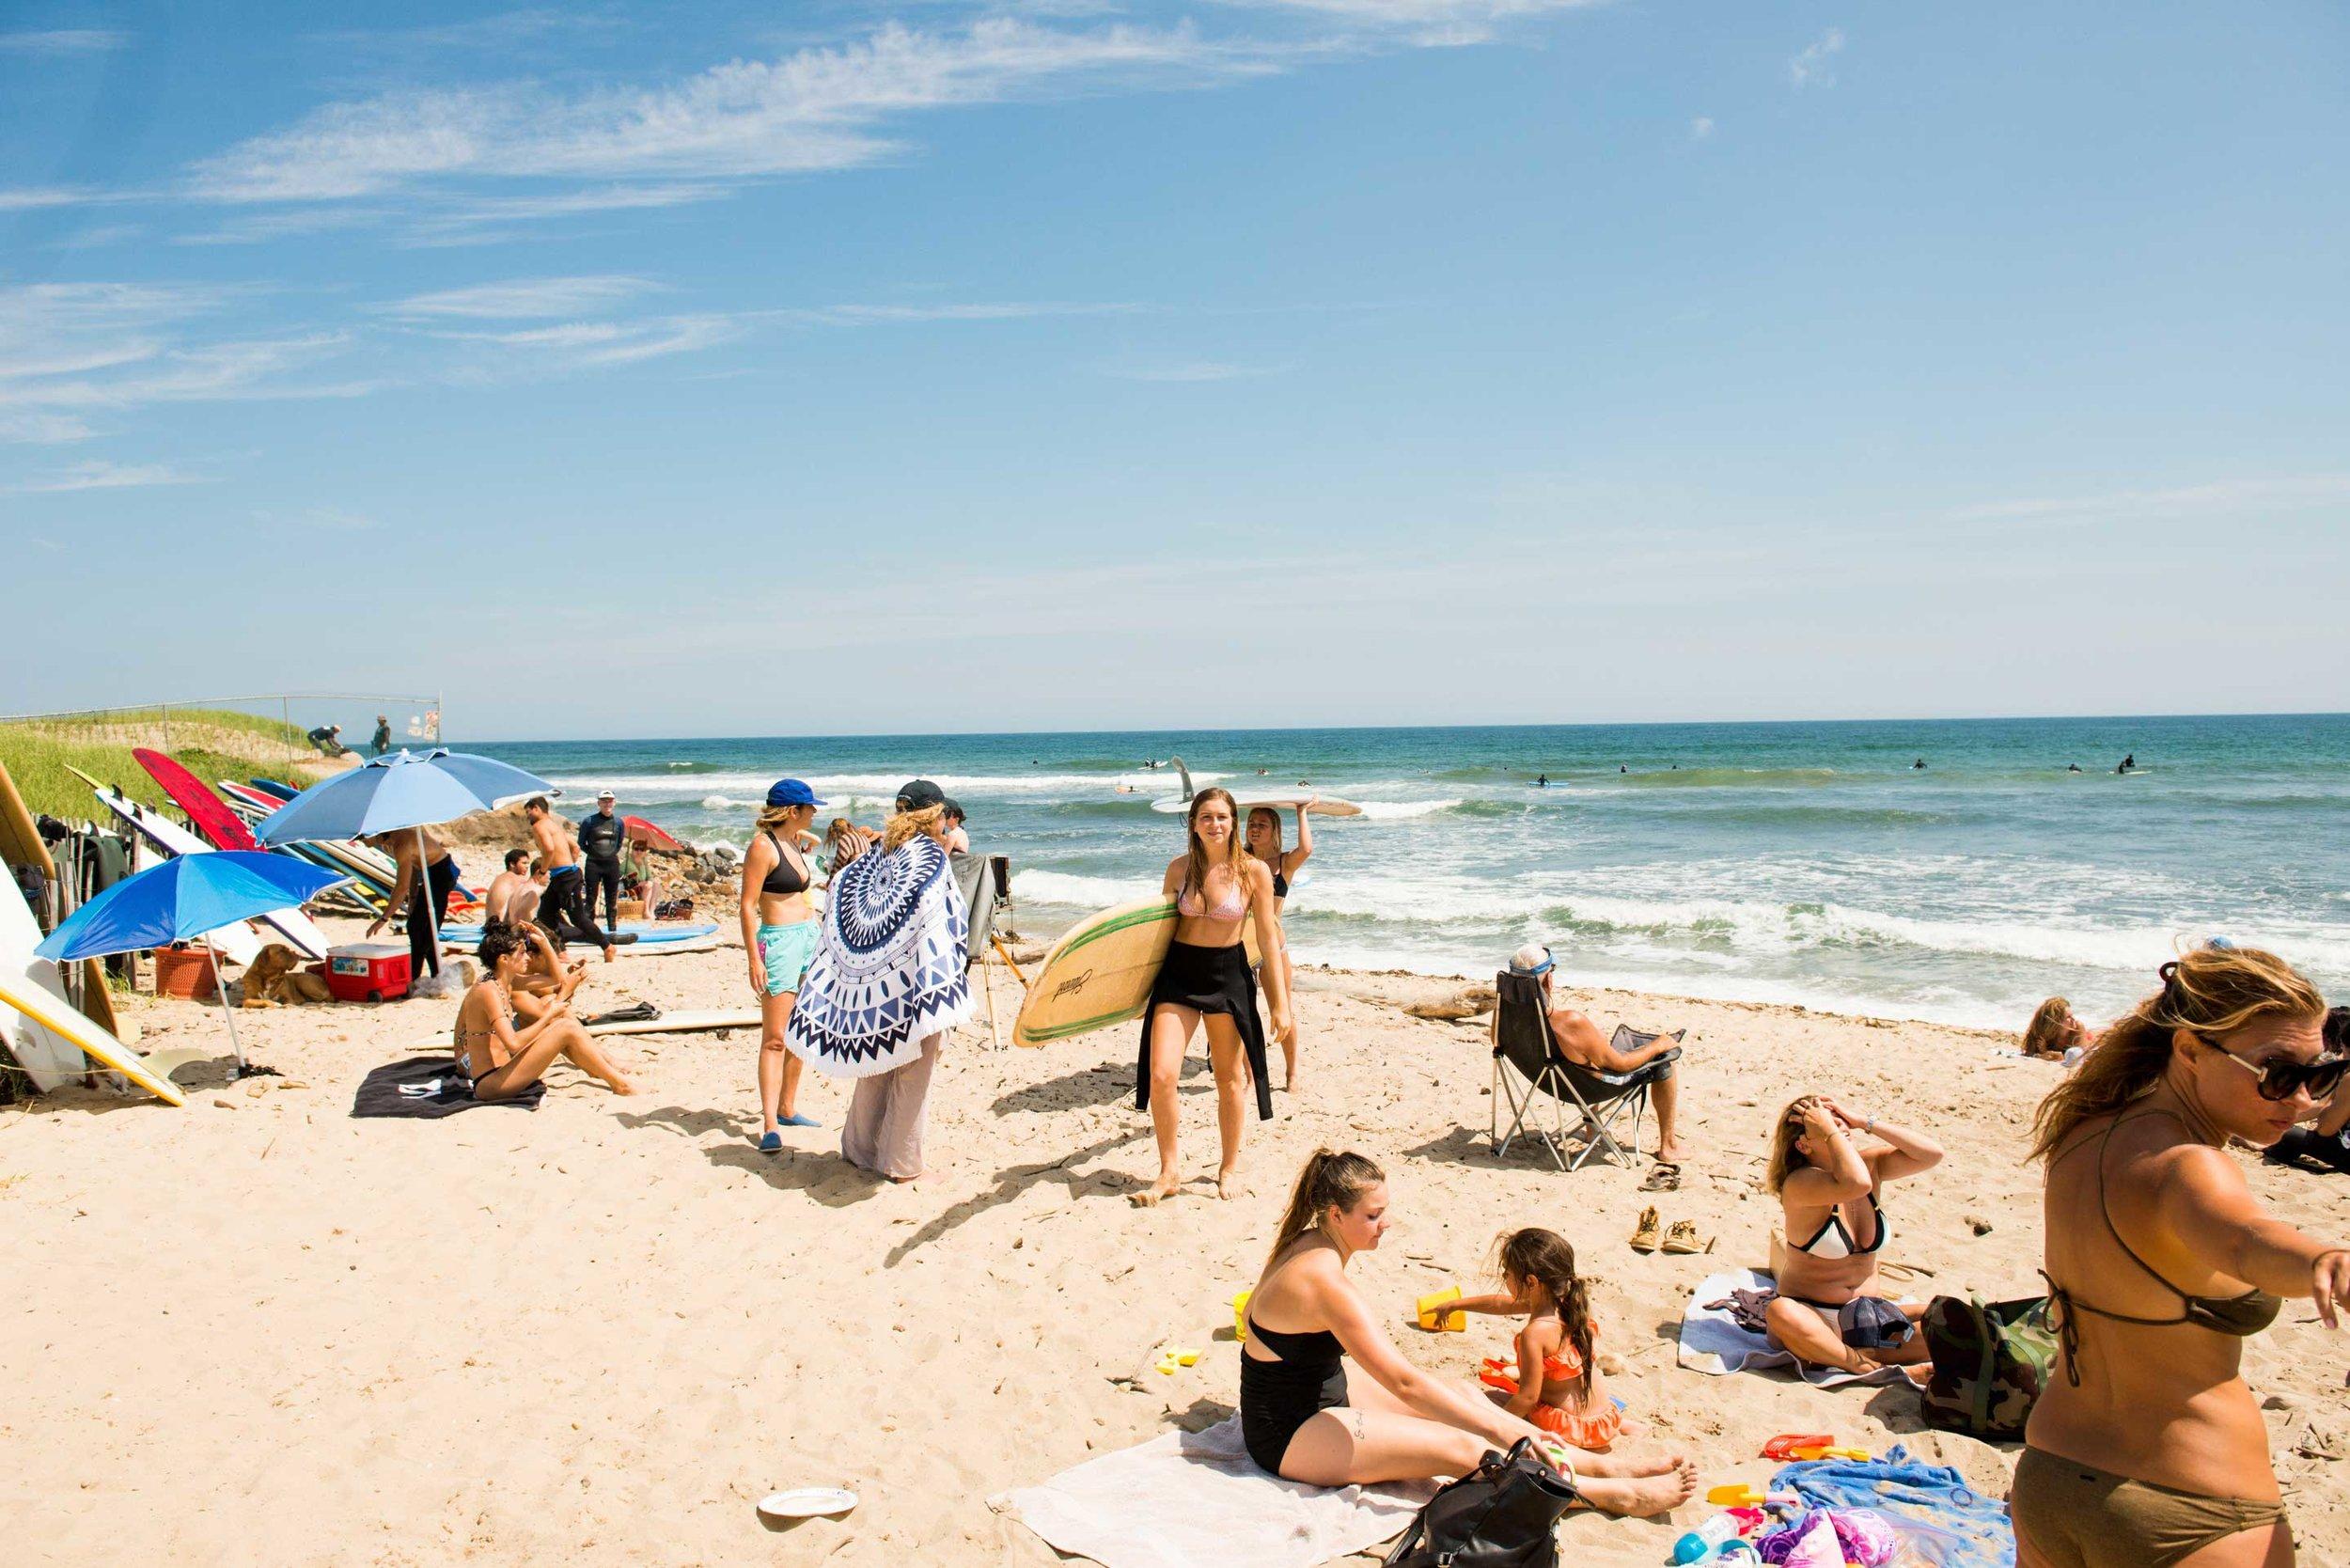 mm-beach-1.jpg